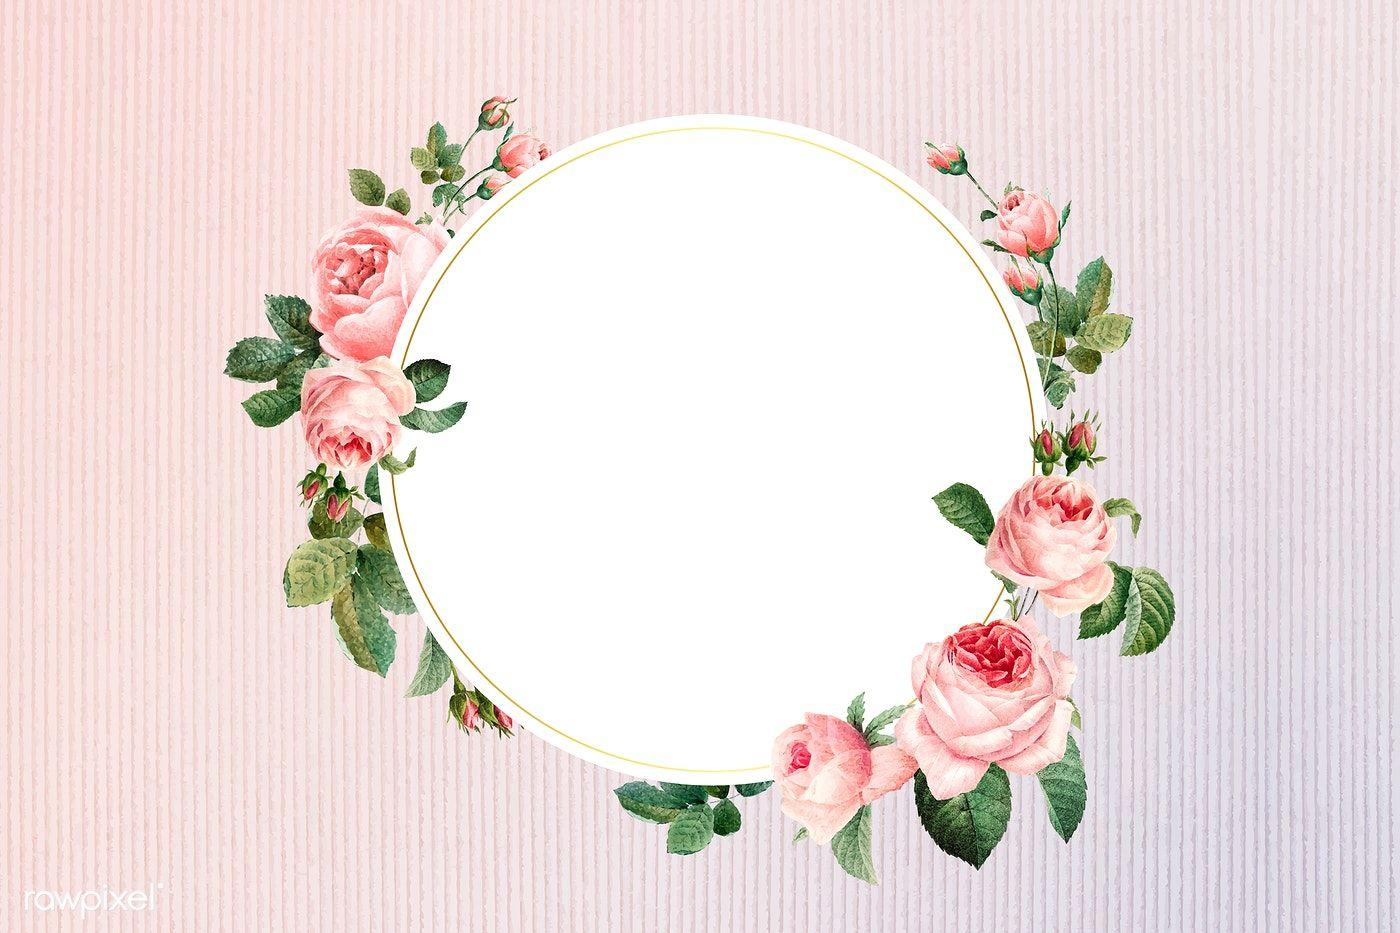 Download Premium Vector Of Floral Round Frame On A Fabric Background Floral Border Design Floral Border Floral